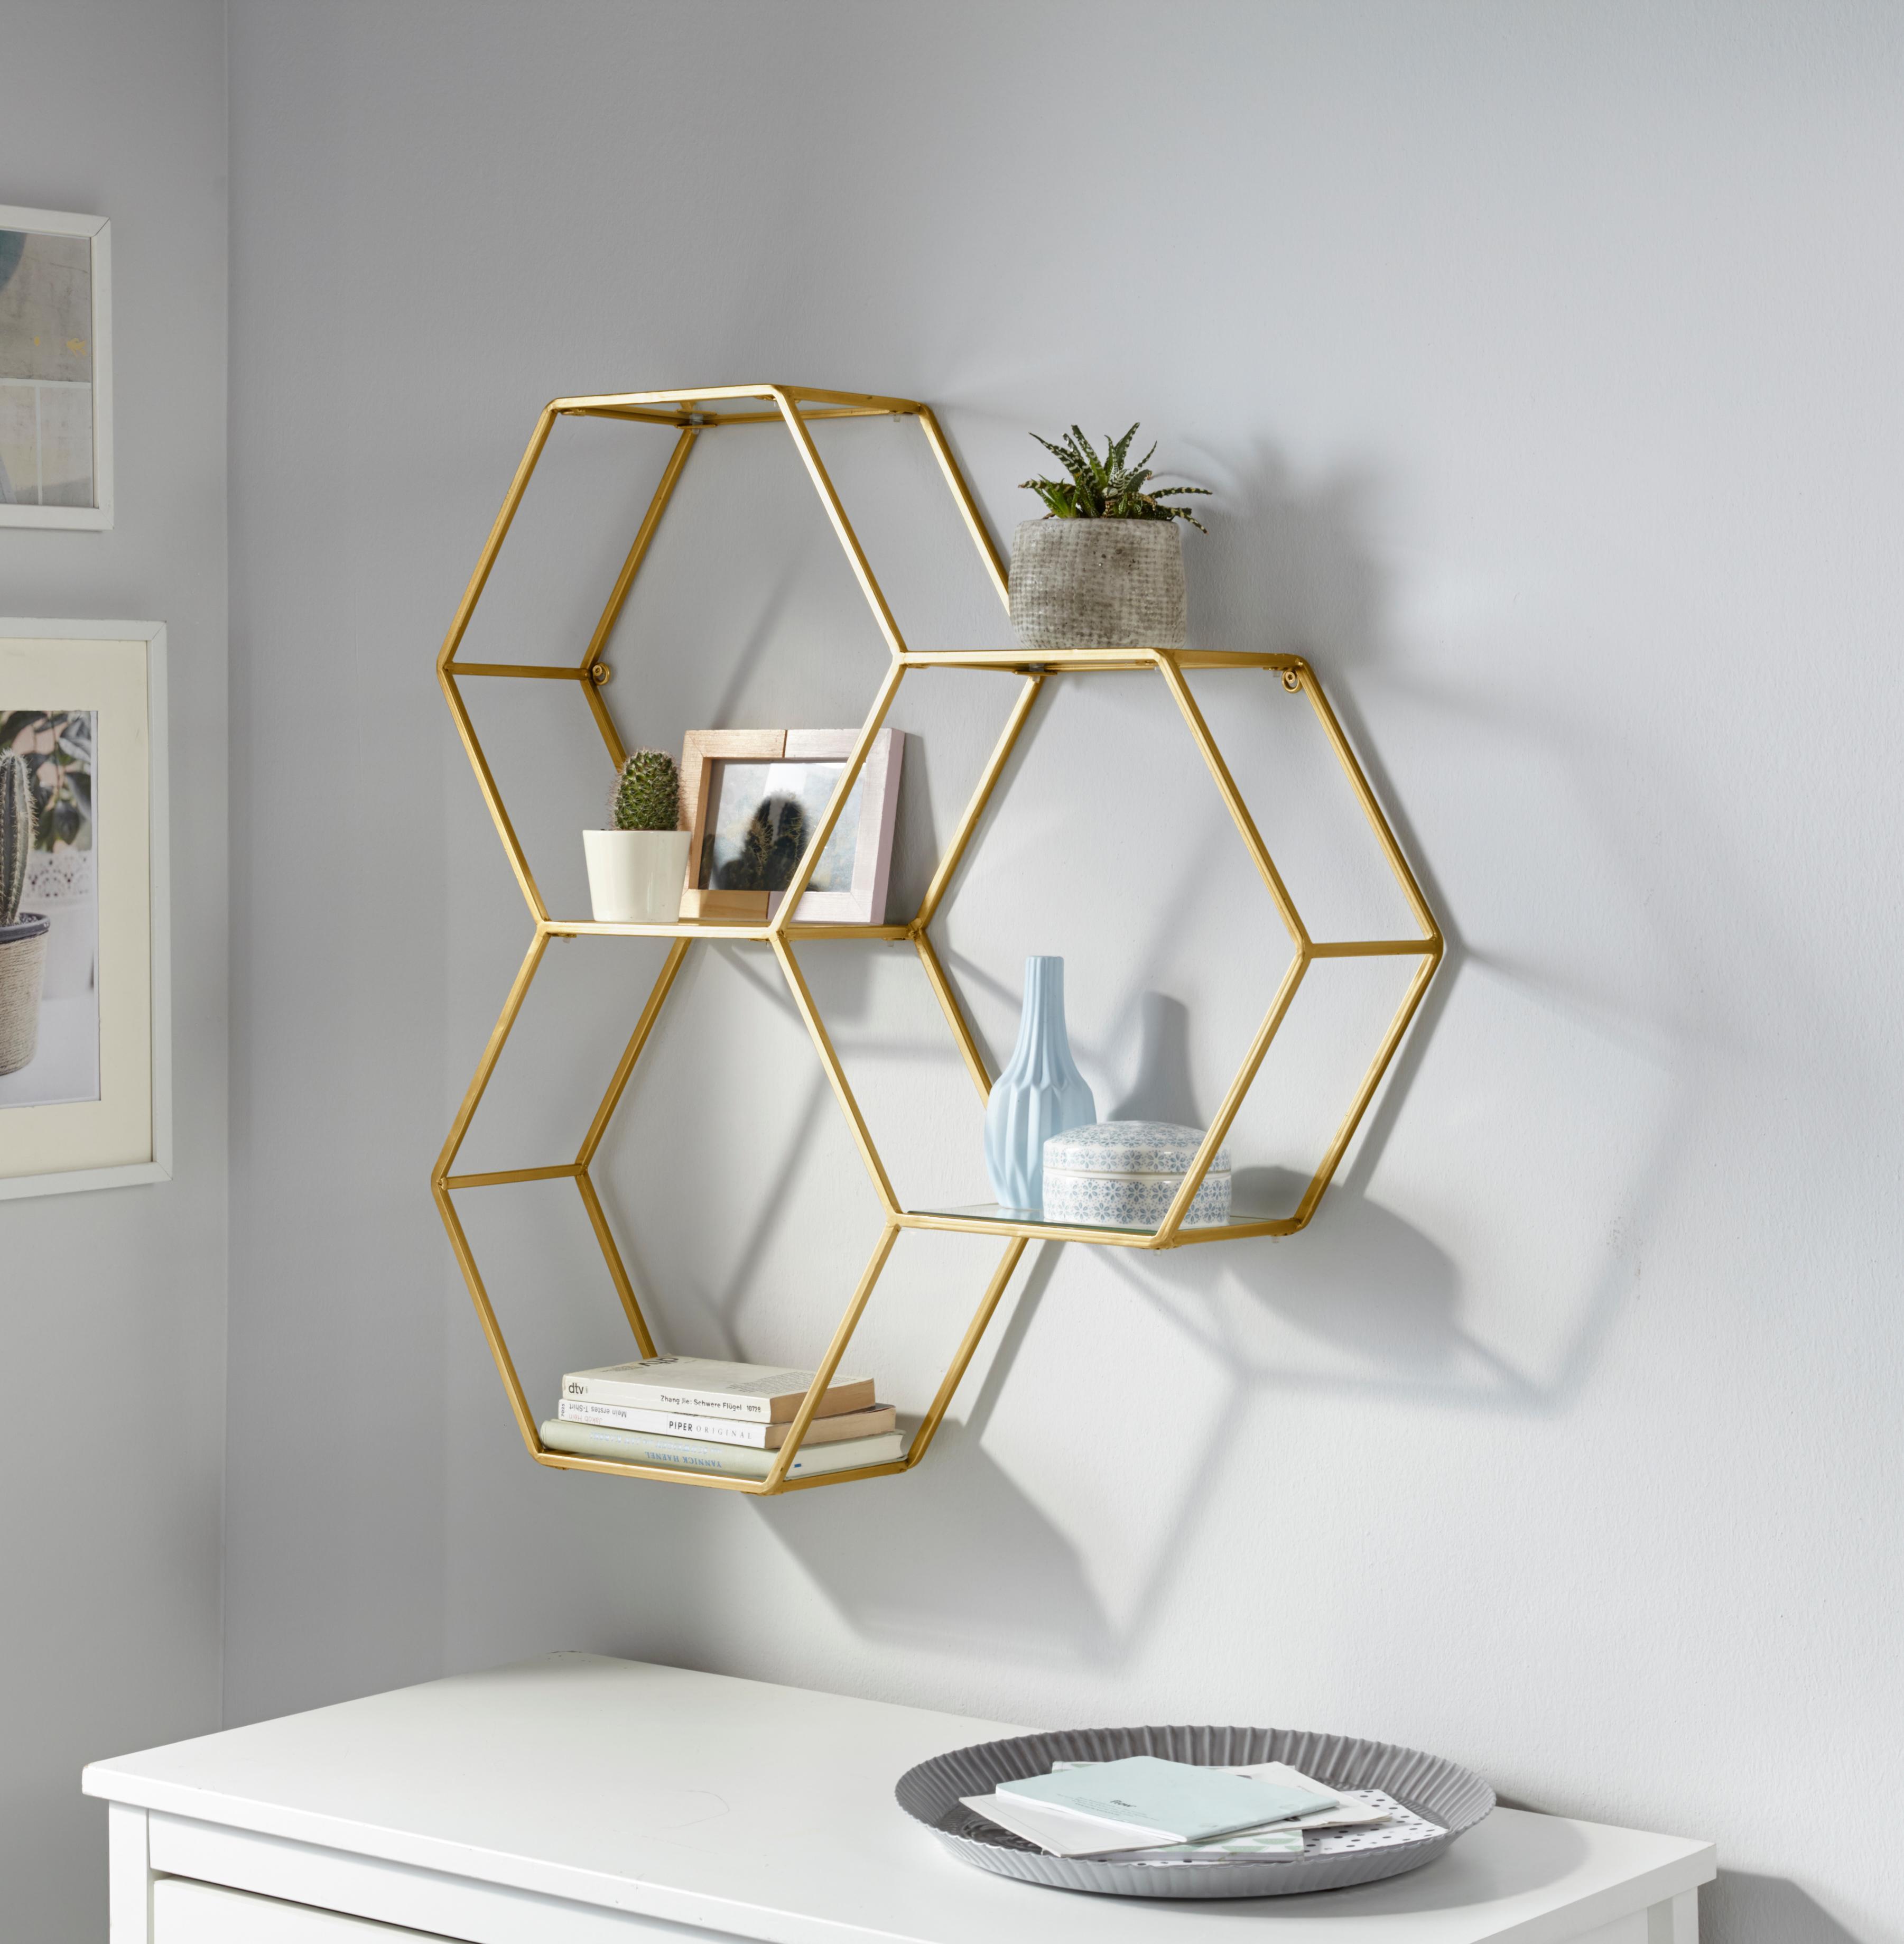 Leonique Wandregal Hexagon Kaufen Baur